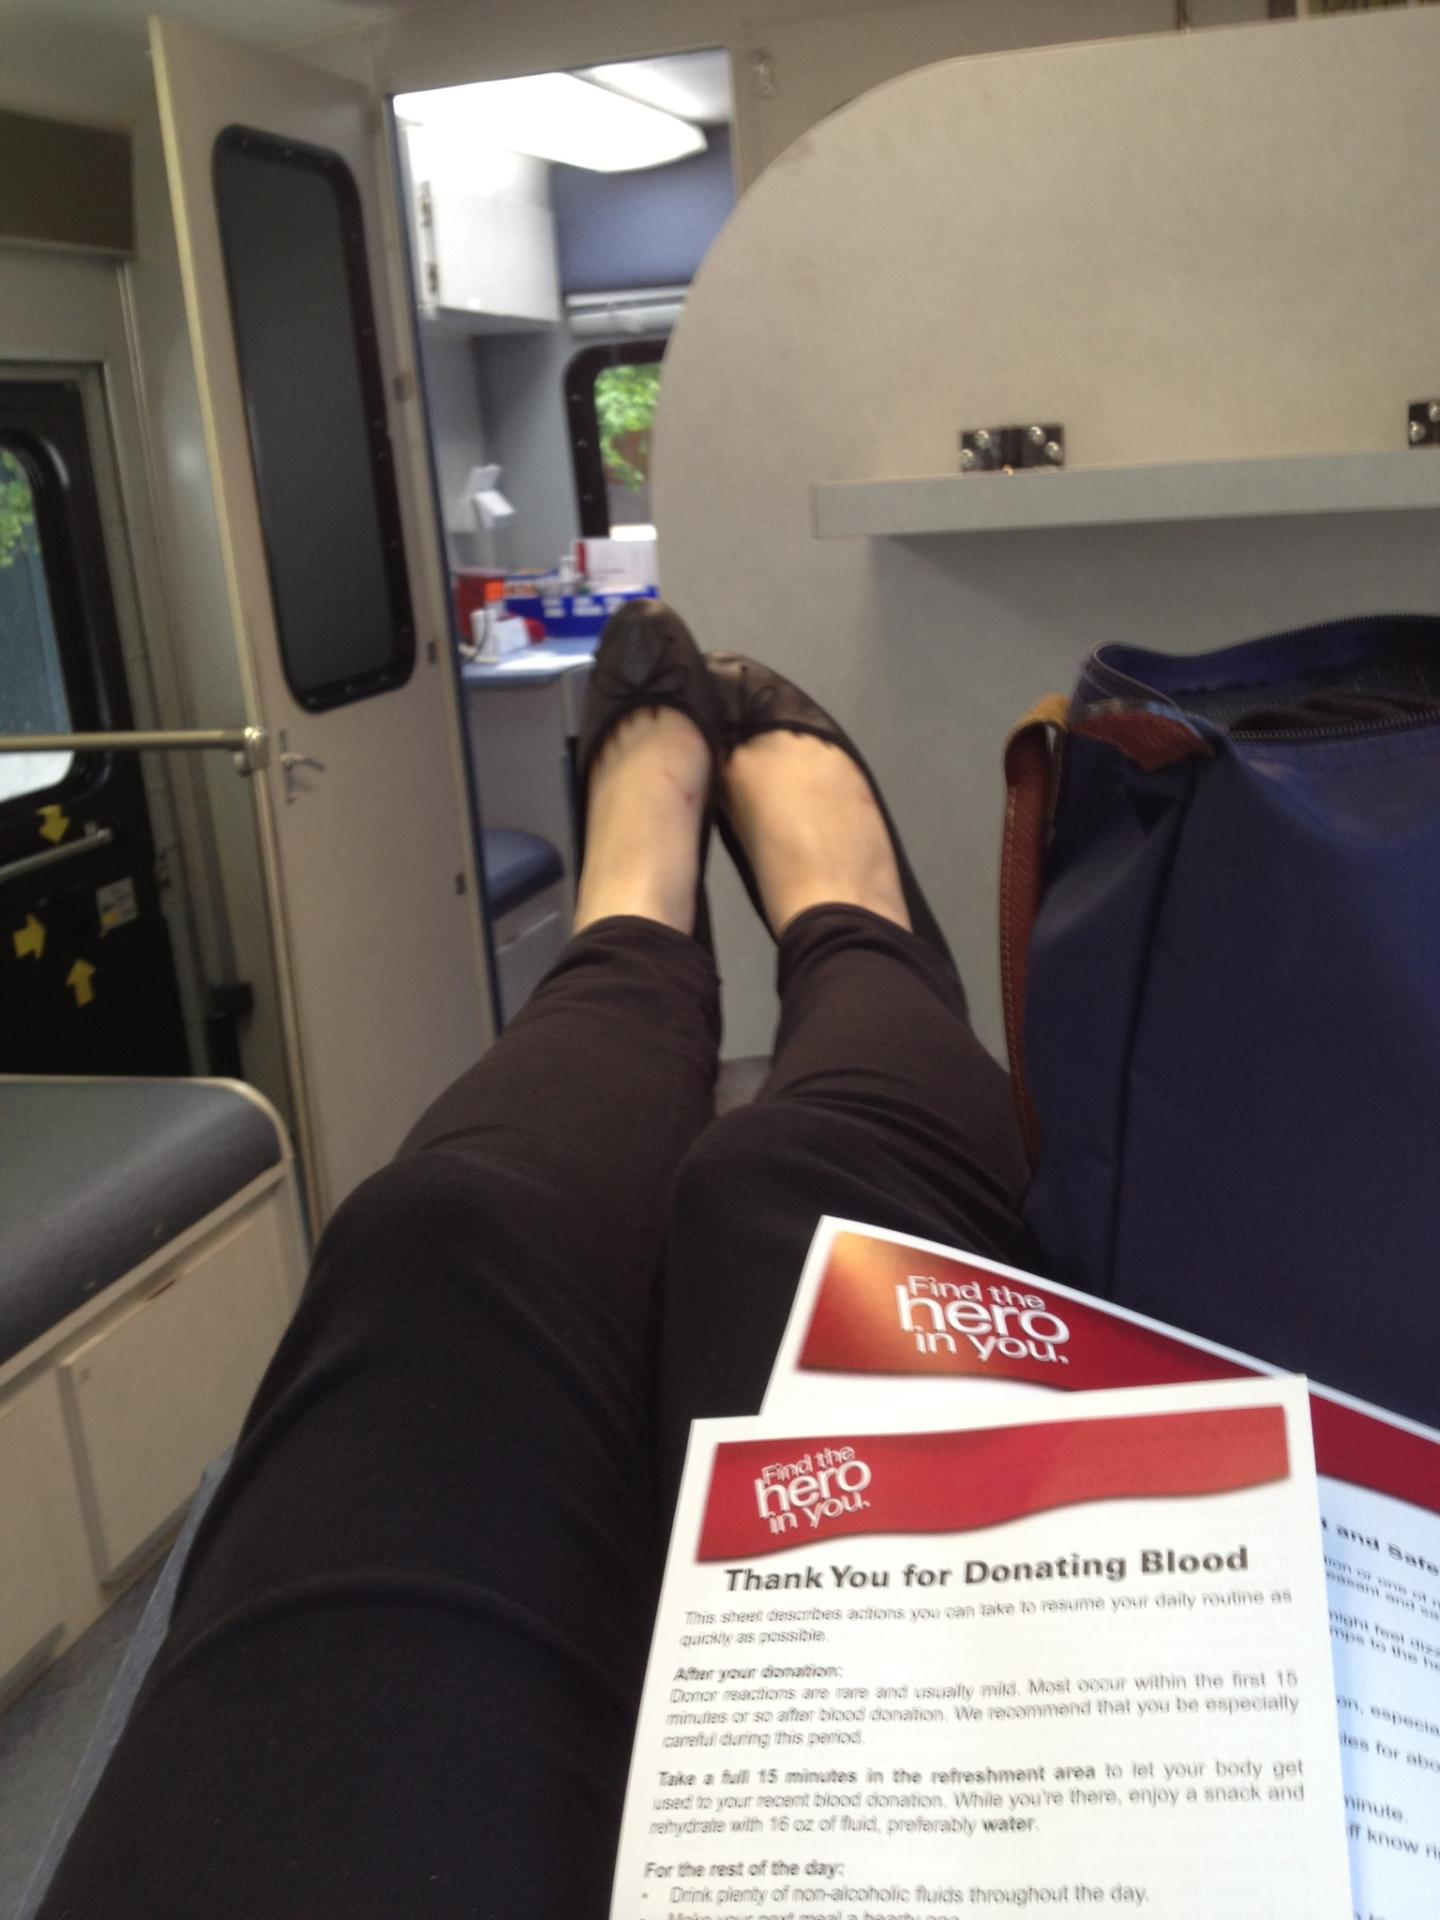 dana donating blood